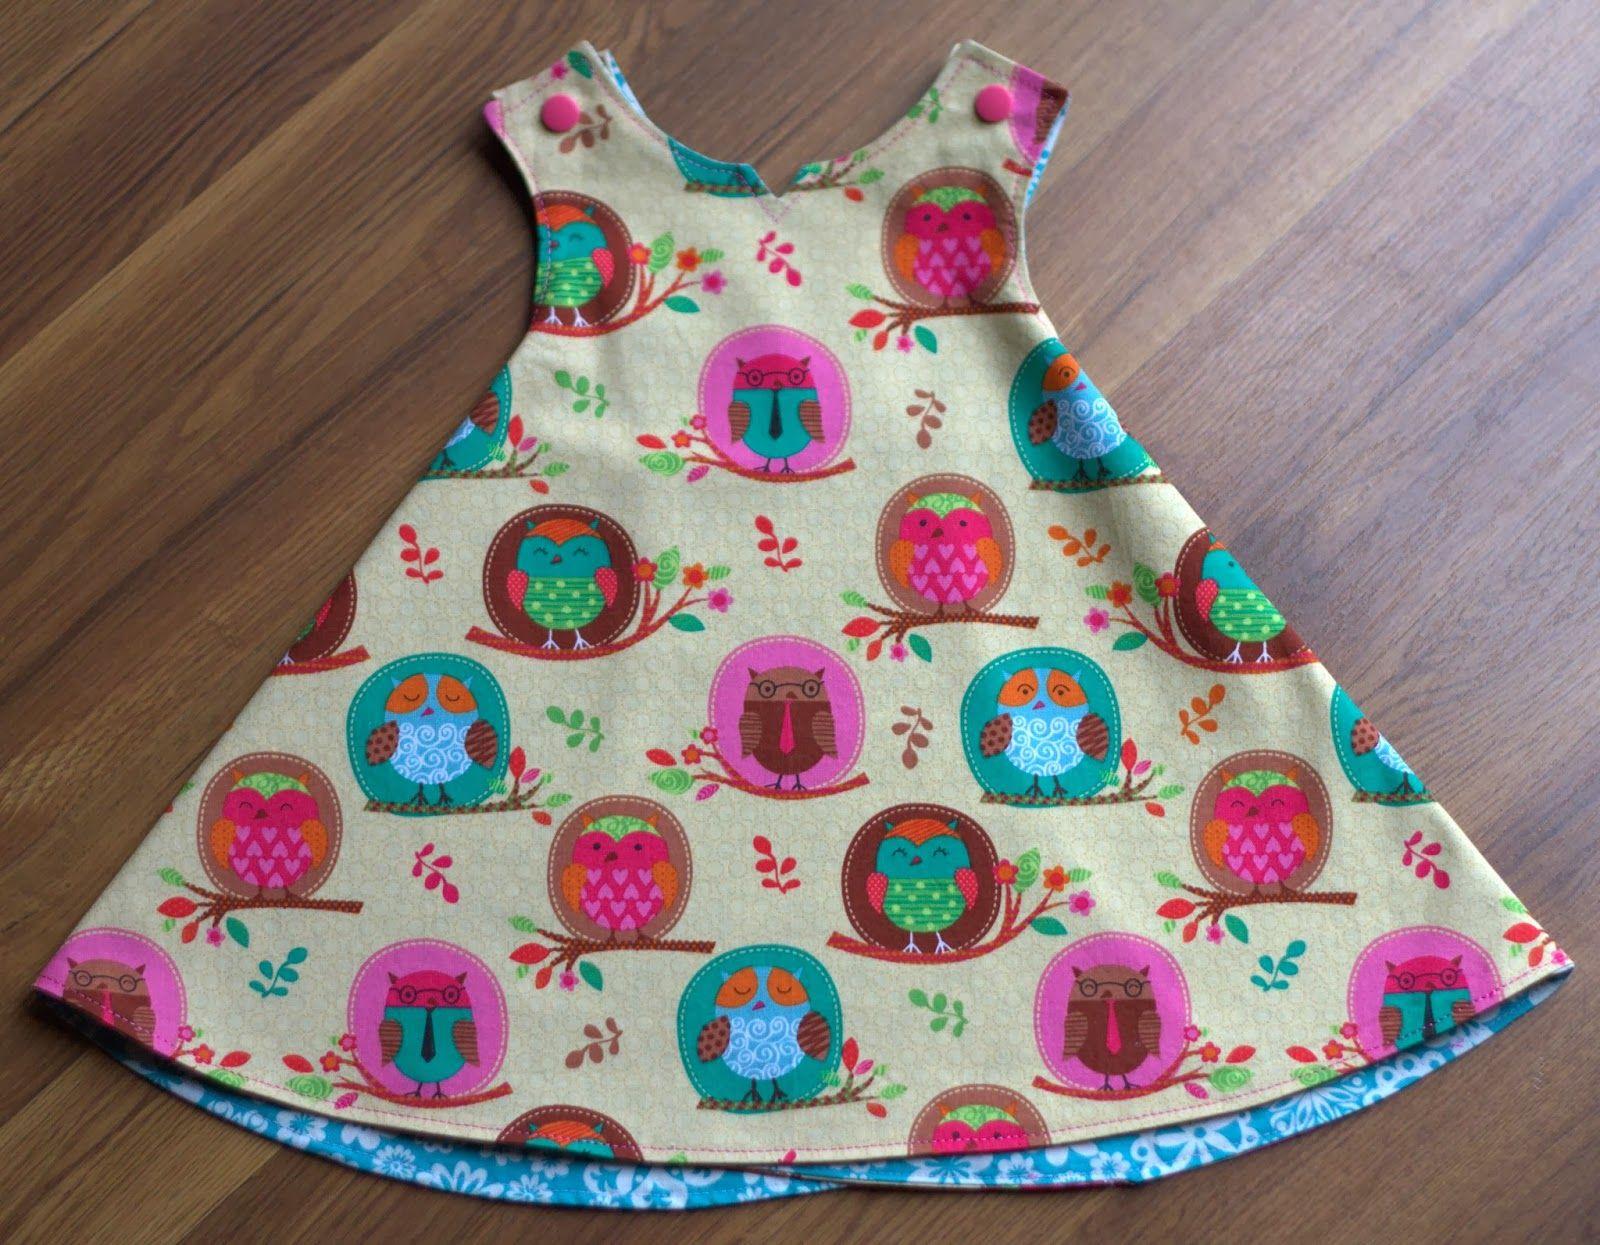 PiePie Designs: DIY Baby Dress: The Aurthi | Sew....a needle pulling ...